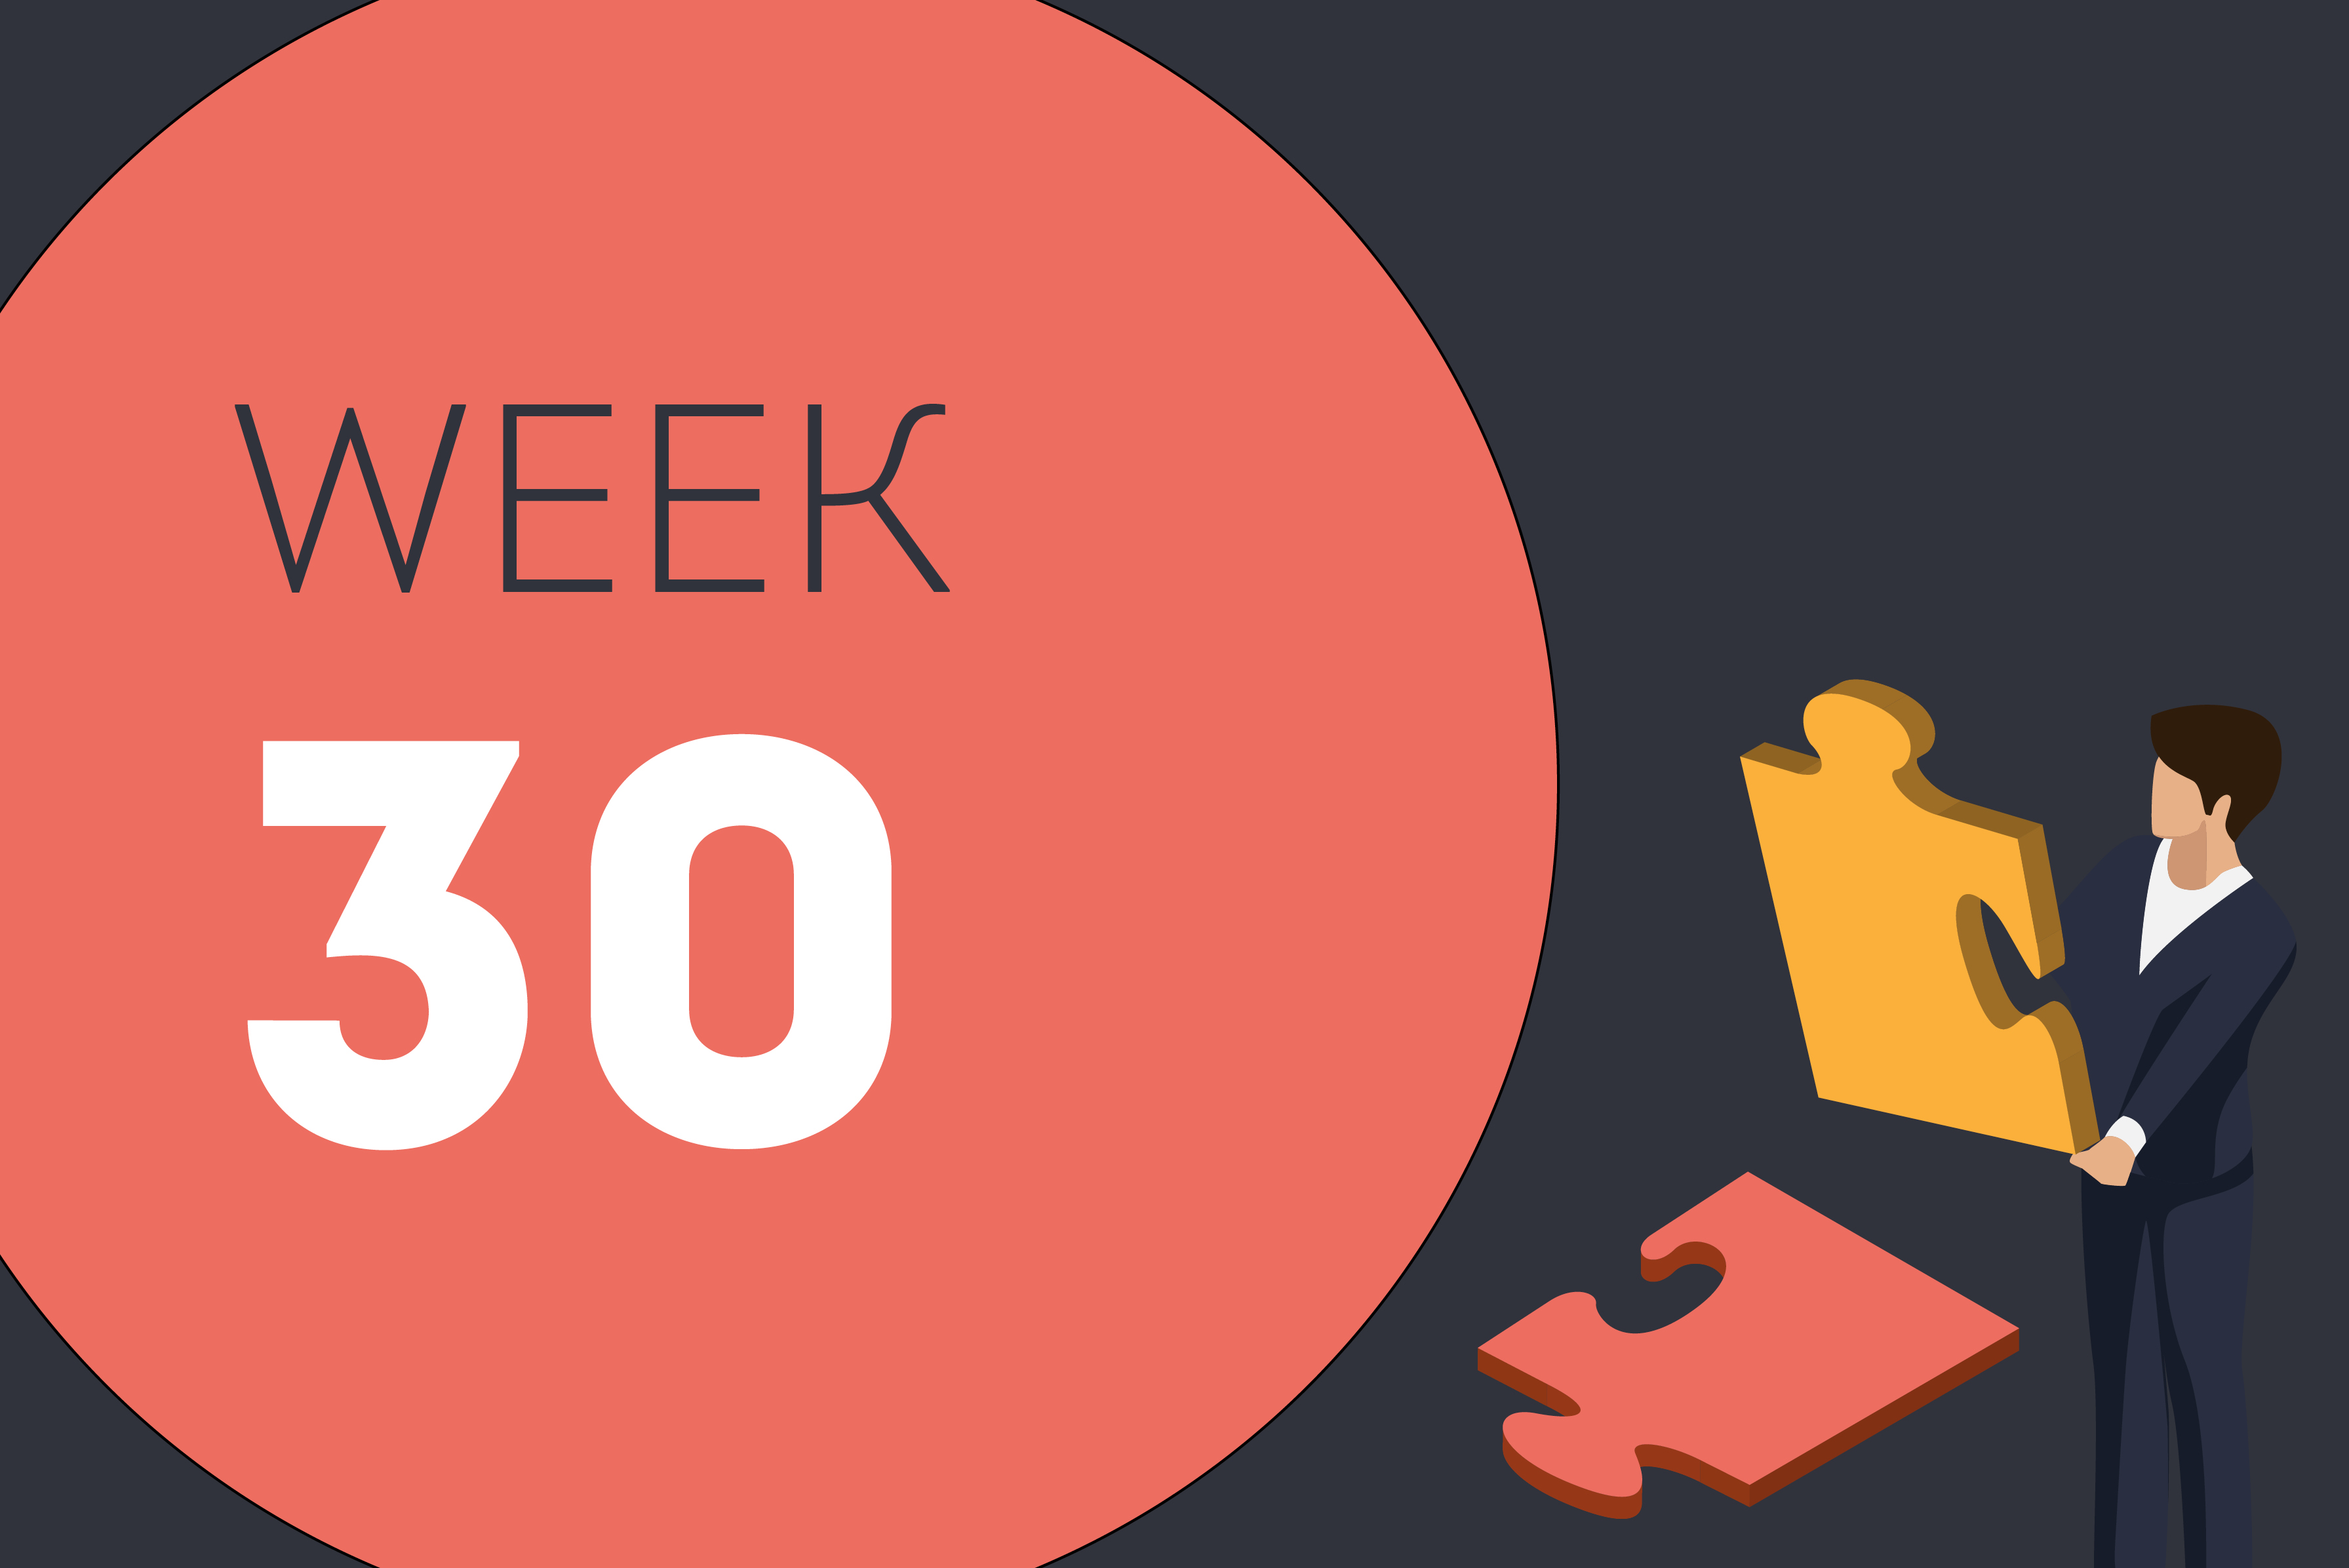 Week ending Friday 30 October 2020